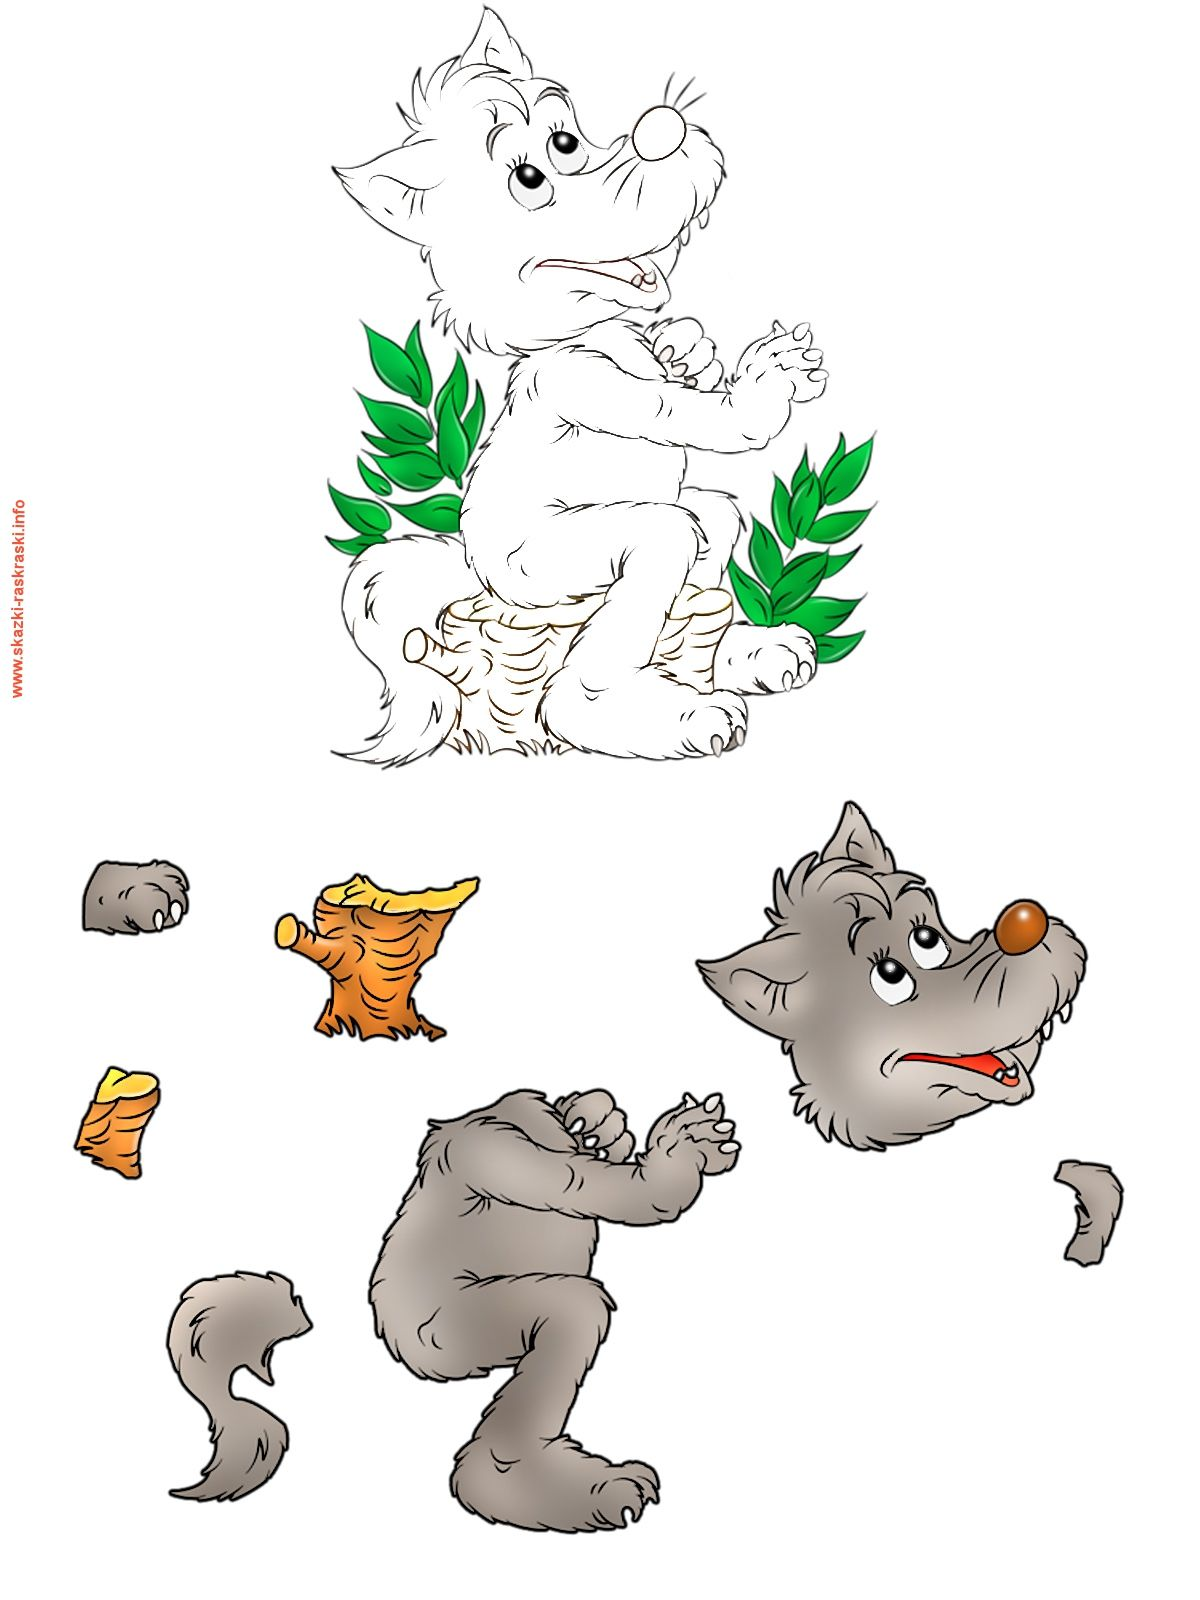 Раскраска Серый волк | Серый волк, Раскраски, Волк